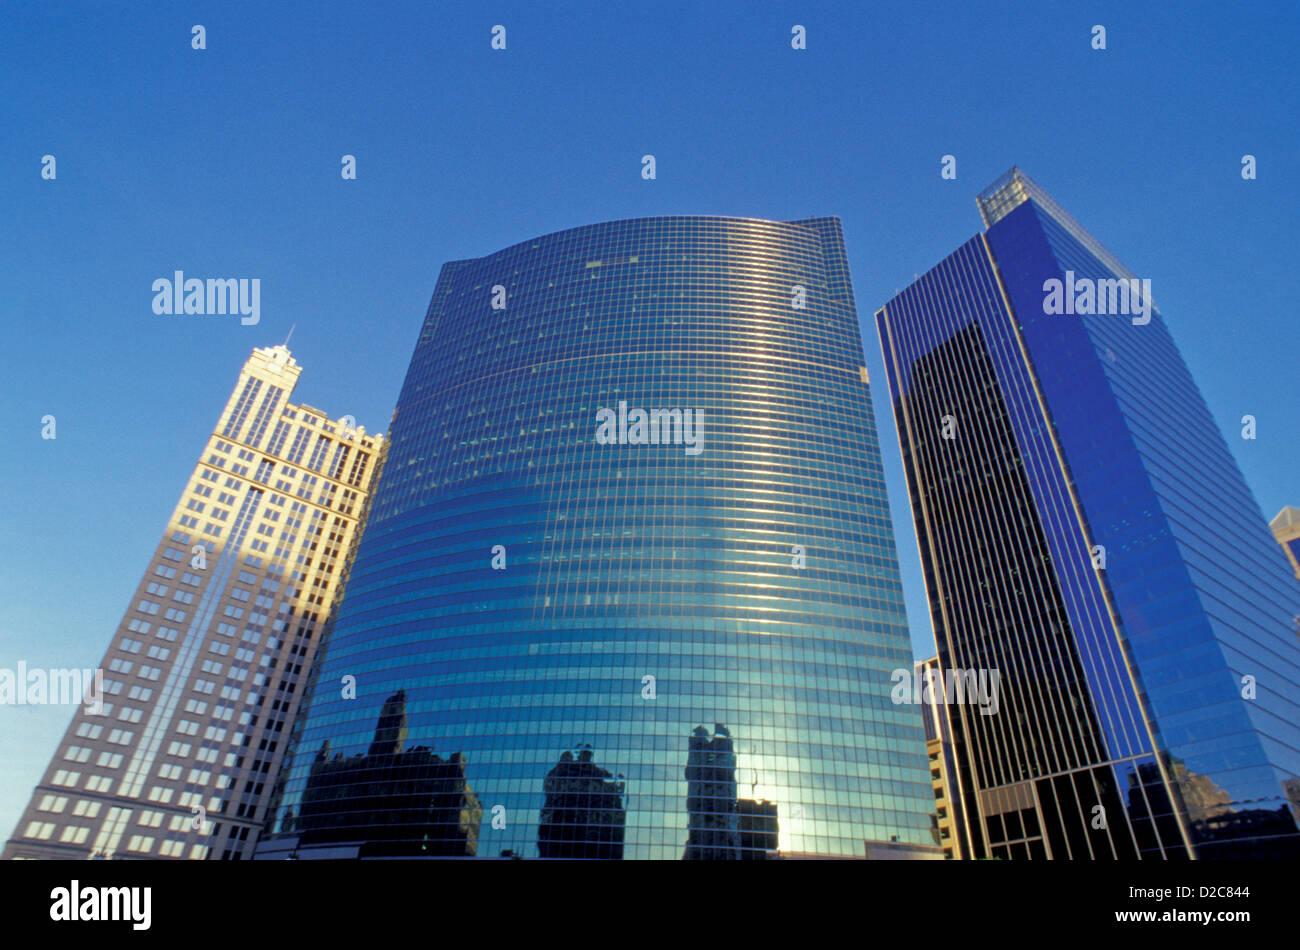 Illinois. Chicago. 333 South Wacker Drive. - Stock Image